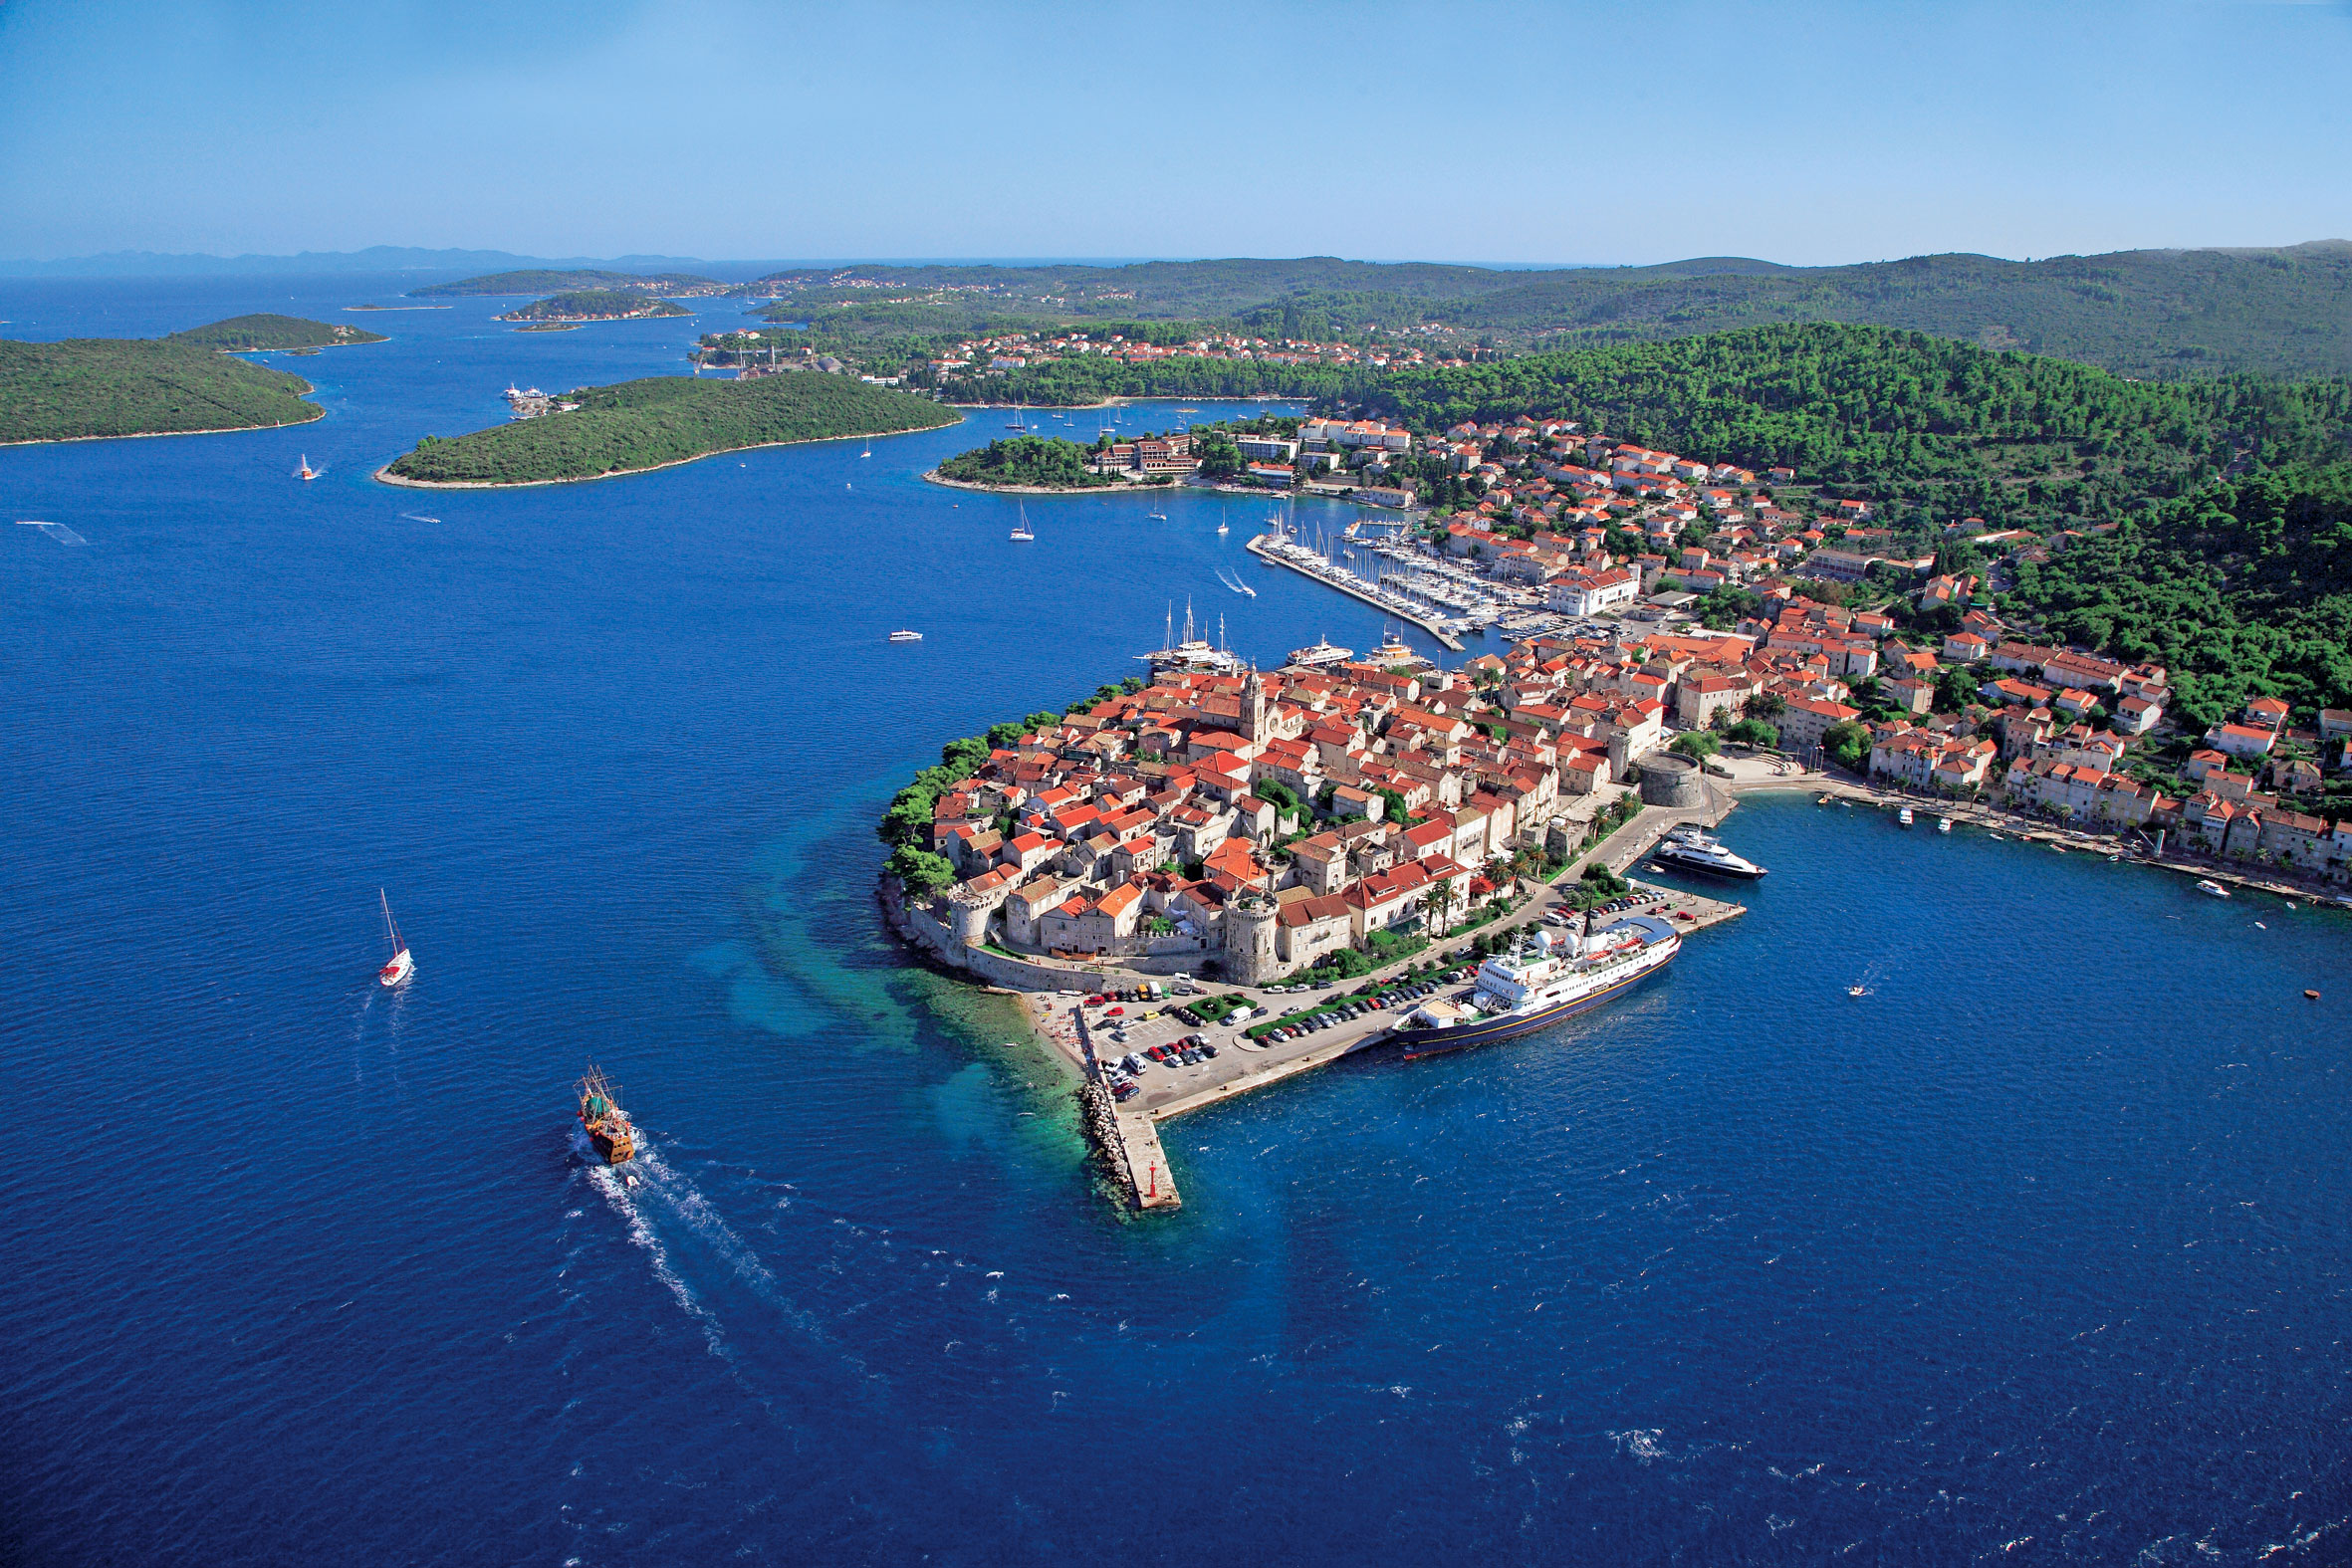 Het eiland Korčula